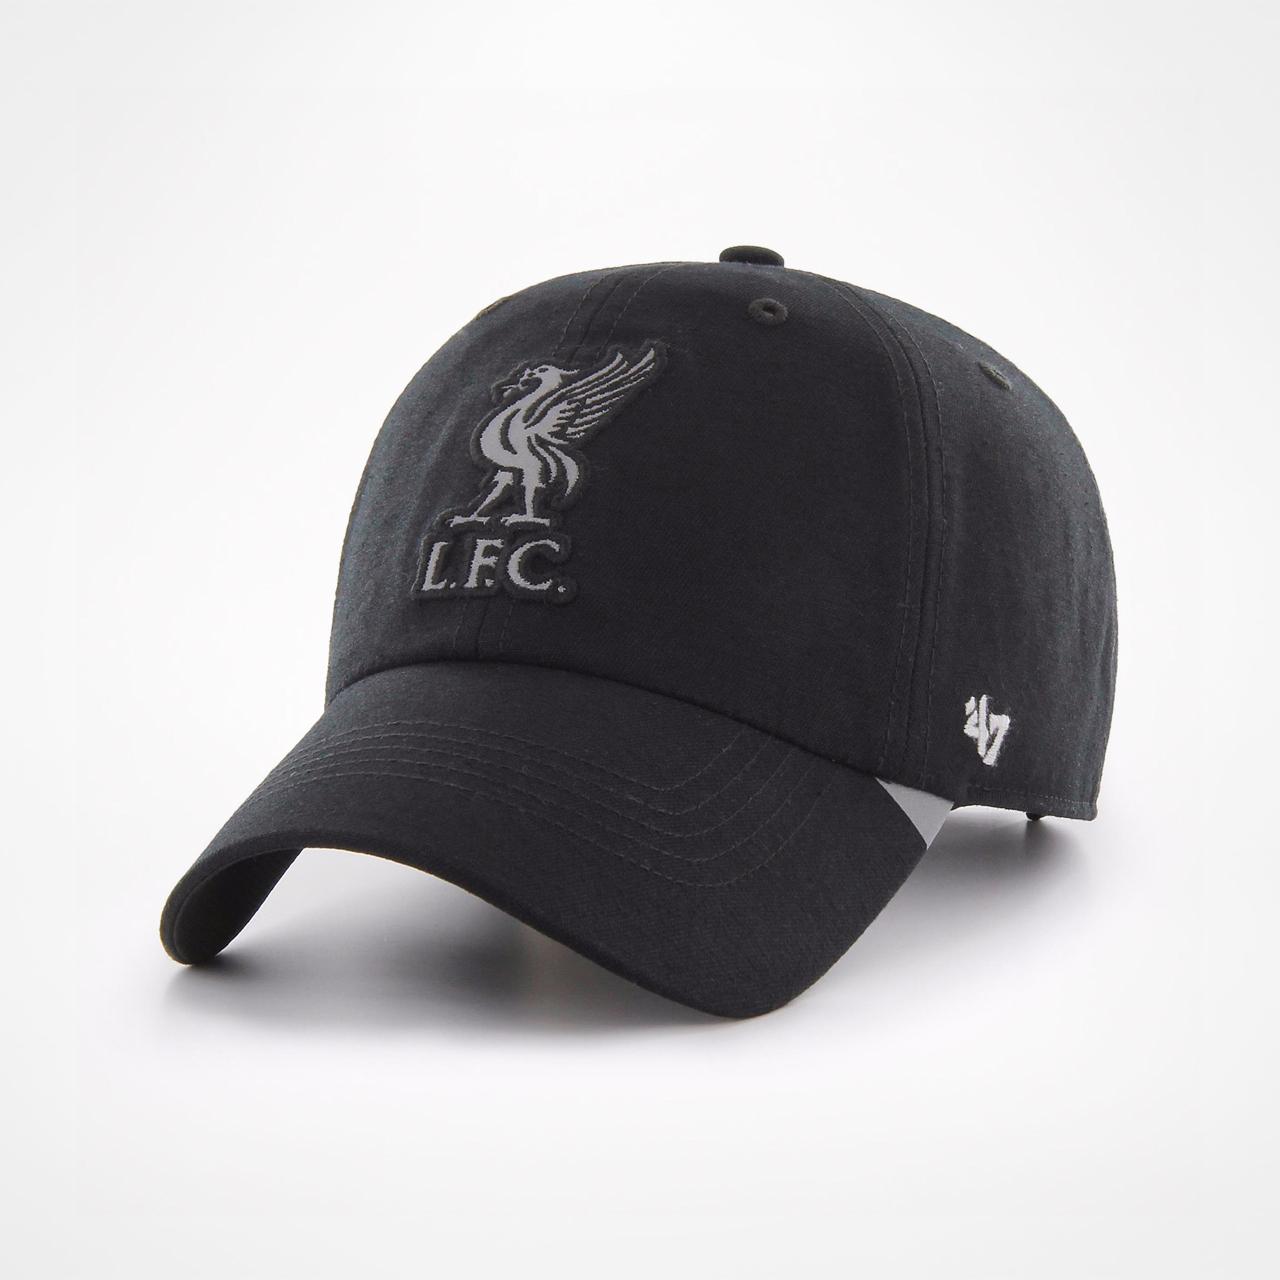 how to clean black cap